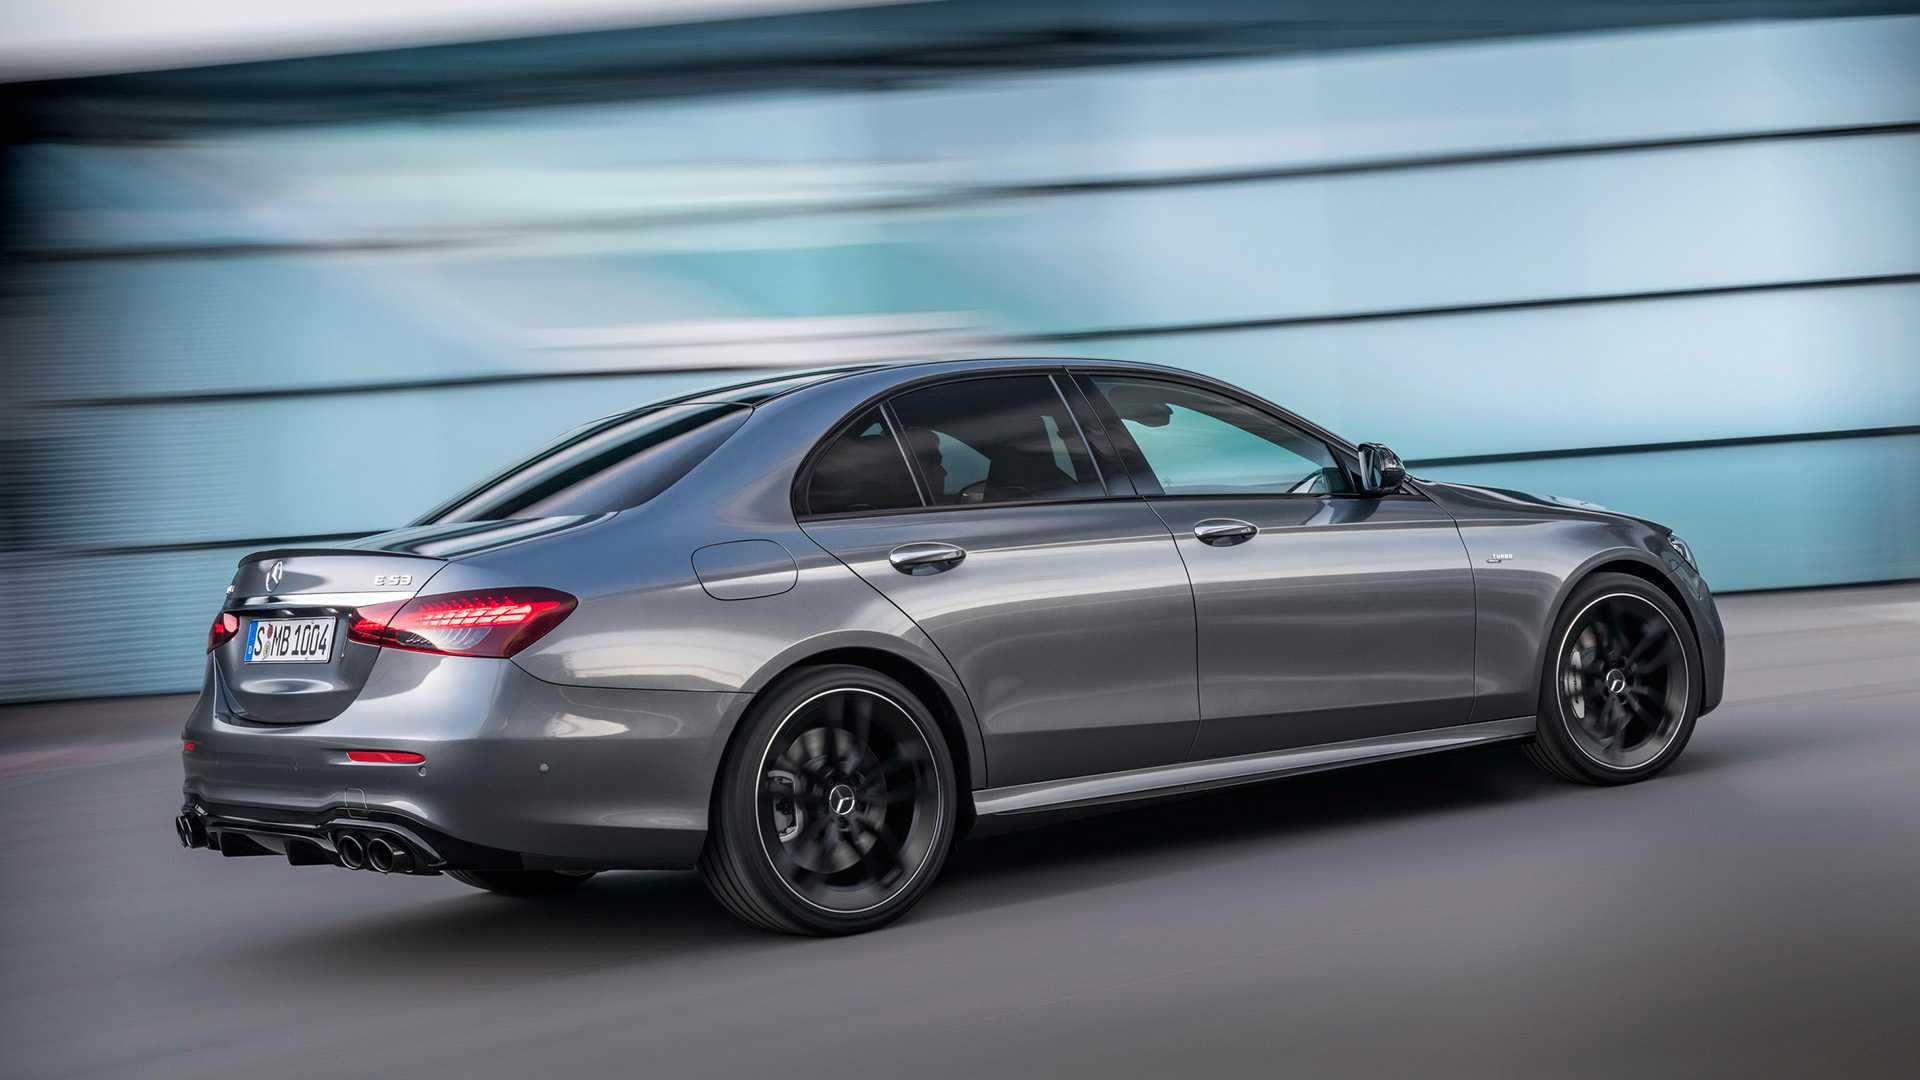 Mercedes-Benz E-класса полностью обновился 1